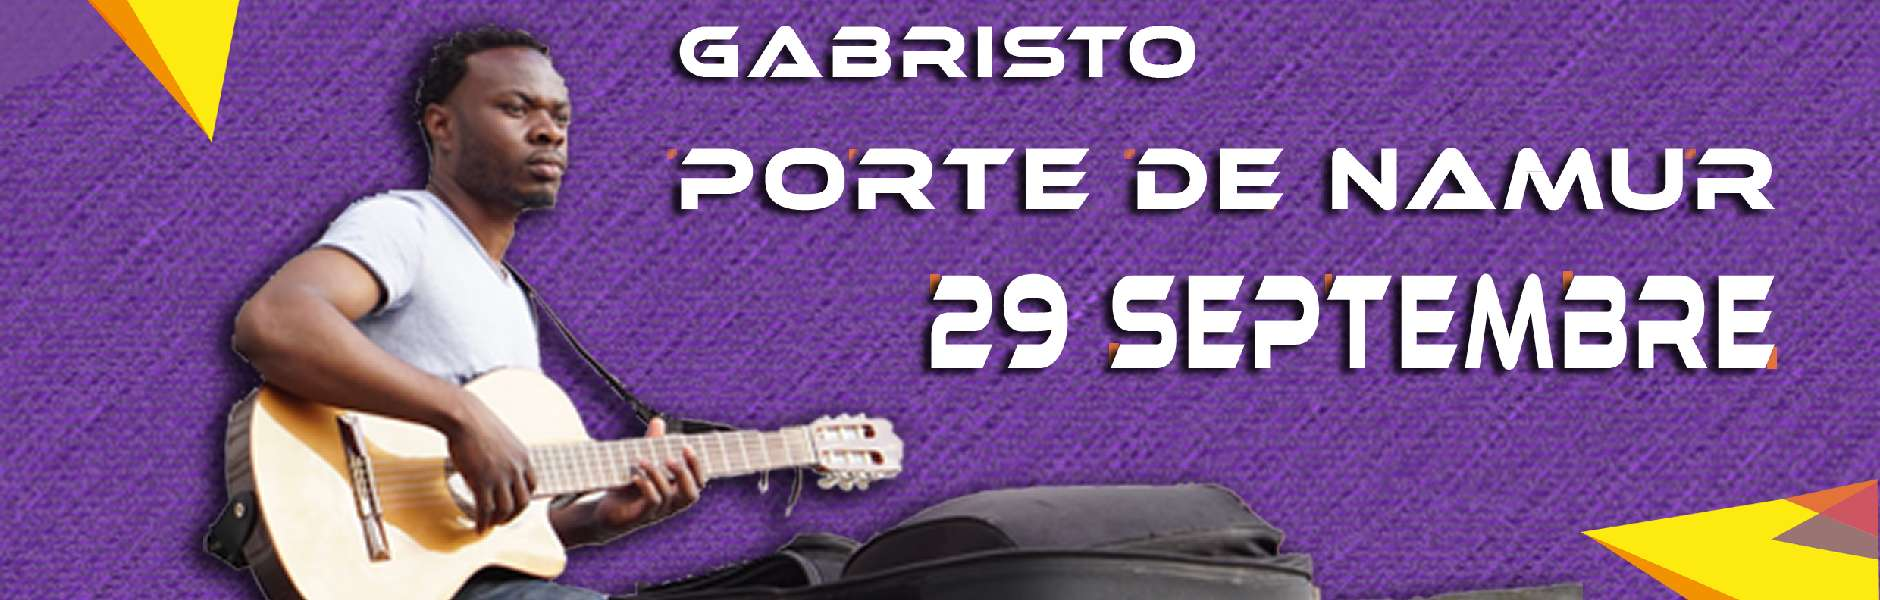 Gabristo